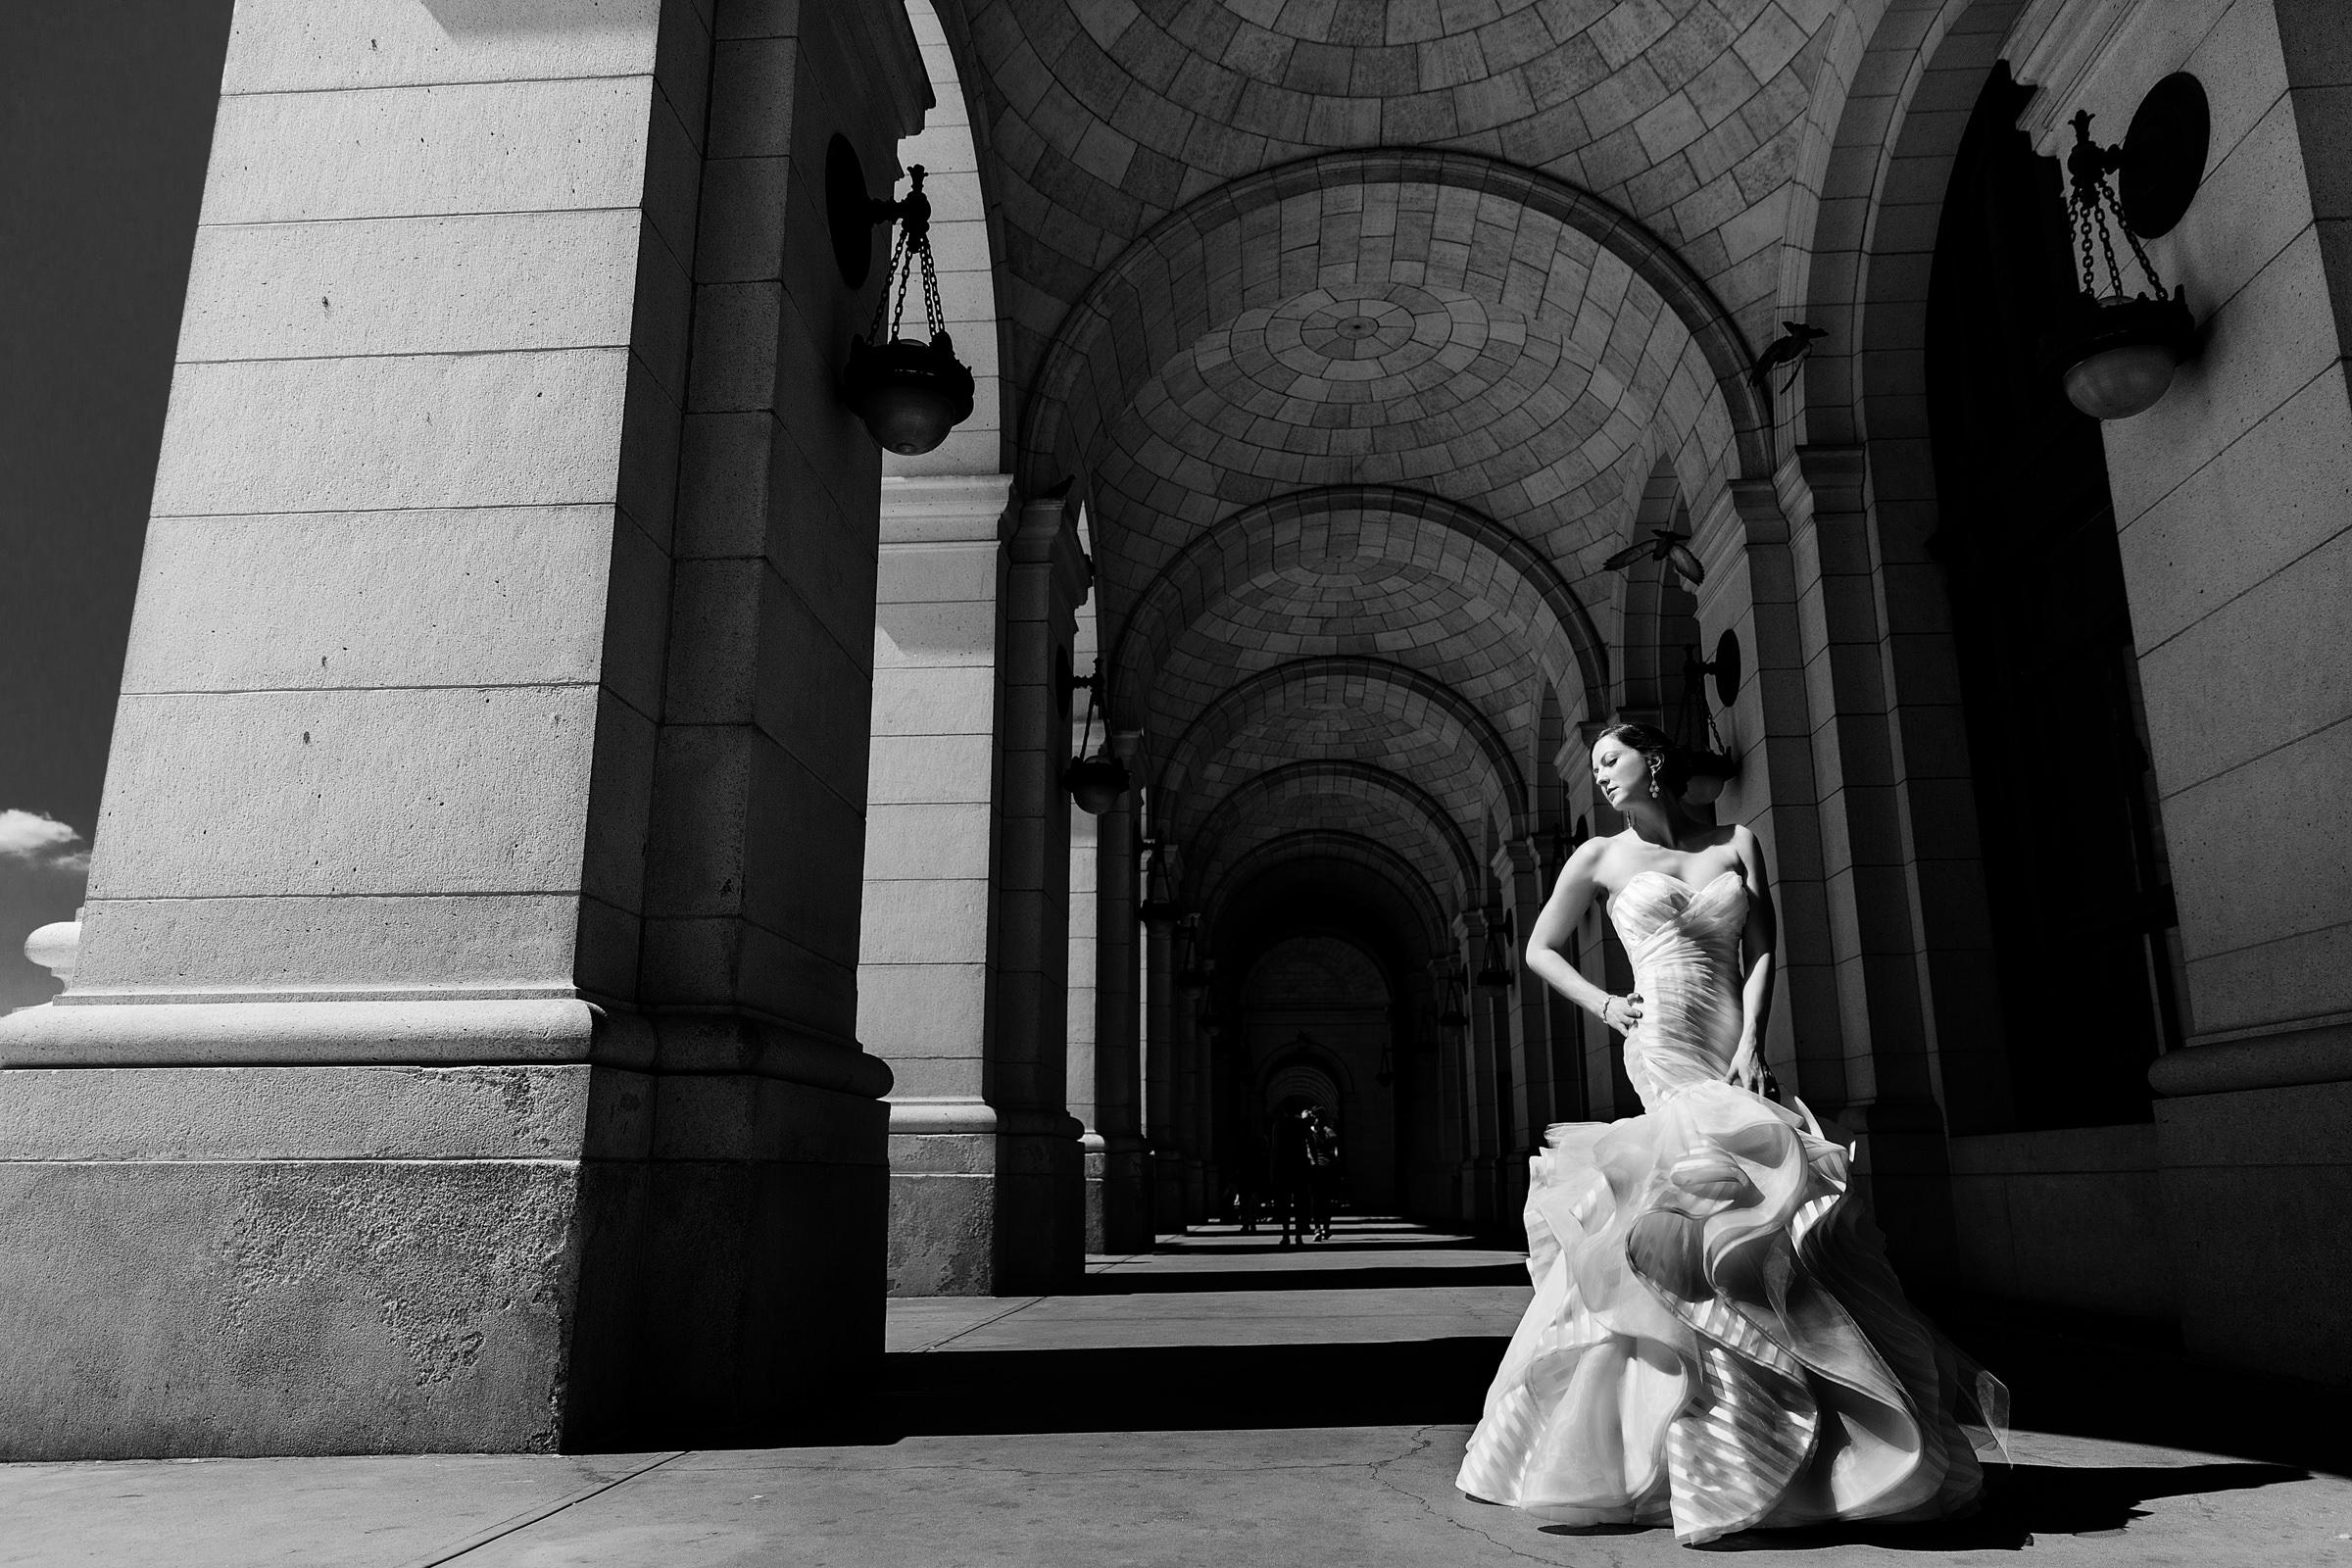 bride-portrait-in-trumpet-gown-dramatic-vaulted-architecture-procopio-photography